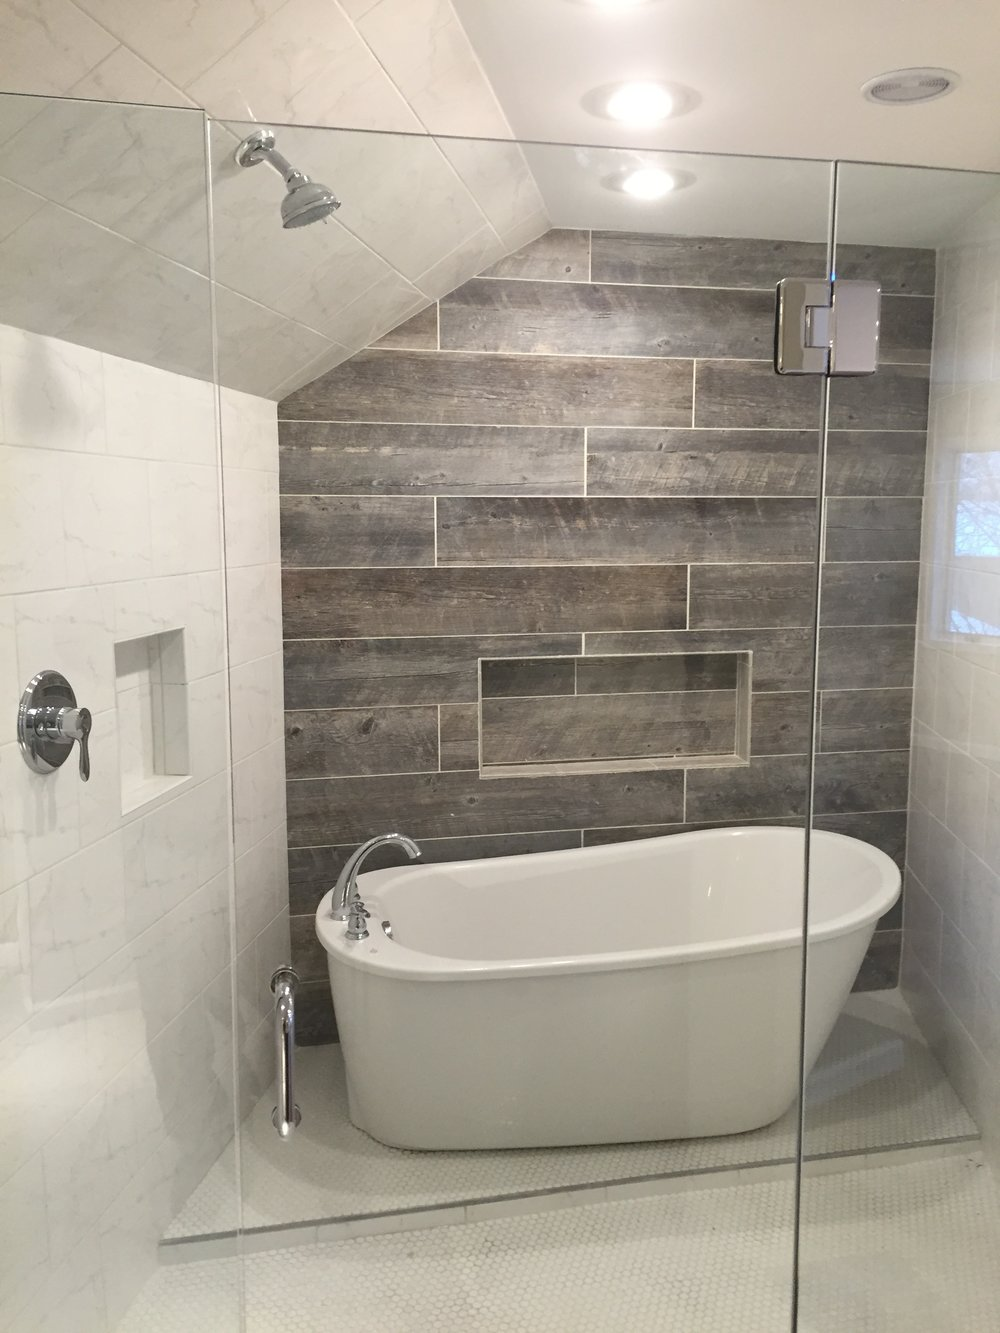 Decks Niantic Ct Bathroom Designs, Bathroom Design Ct